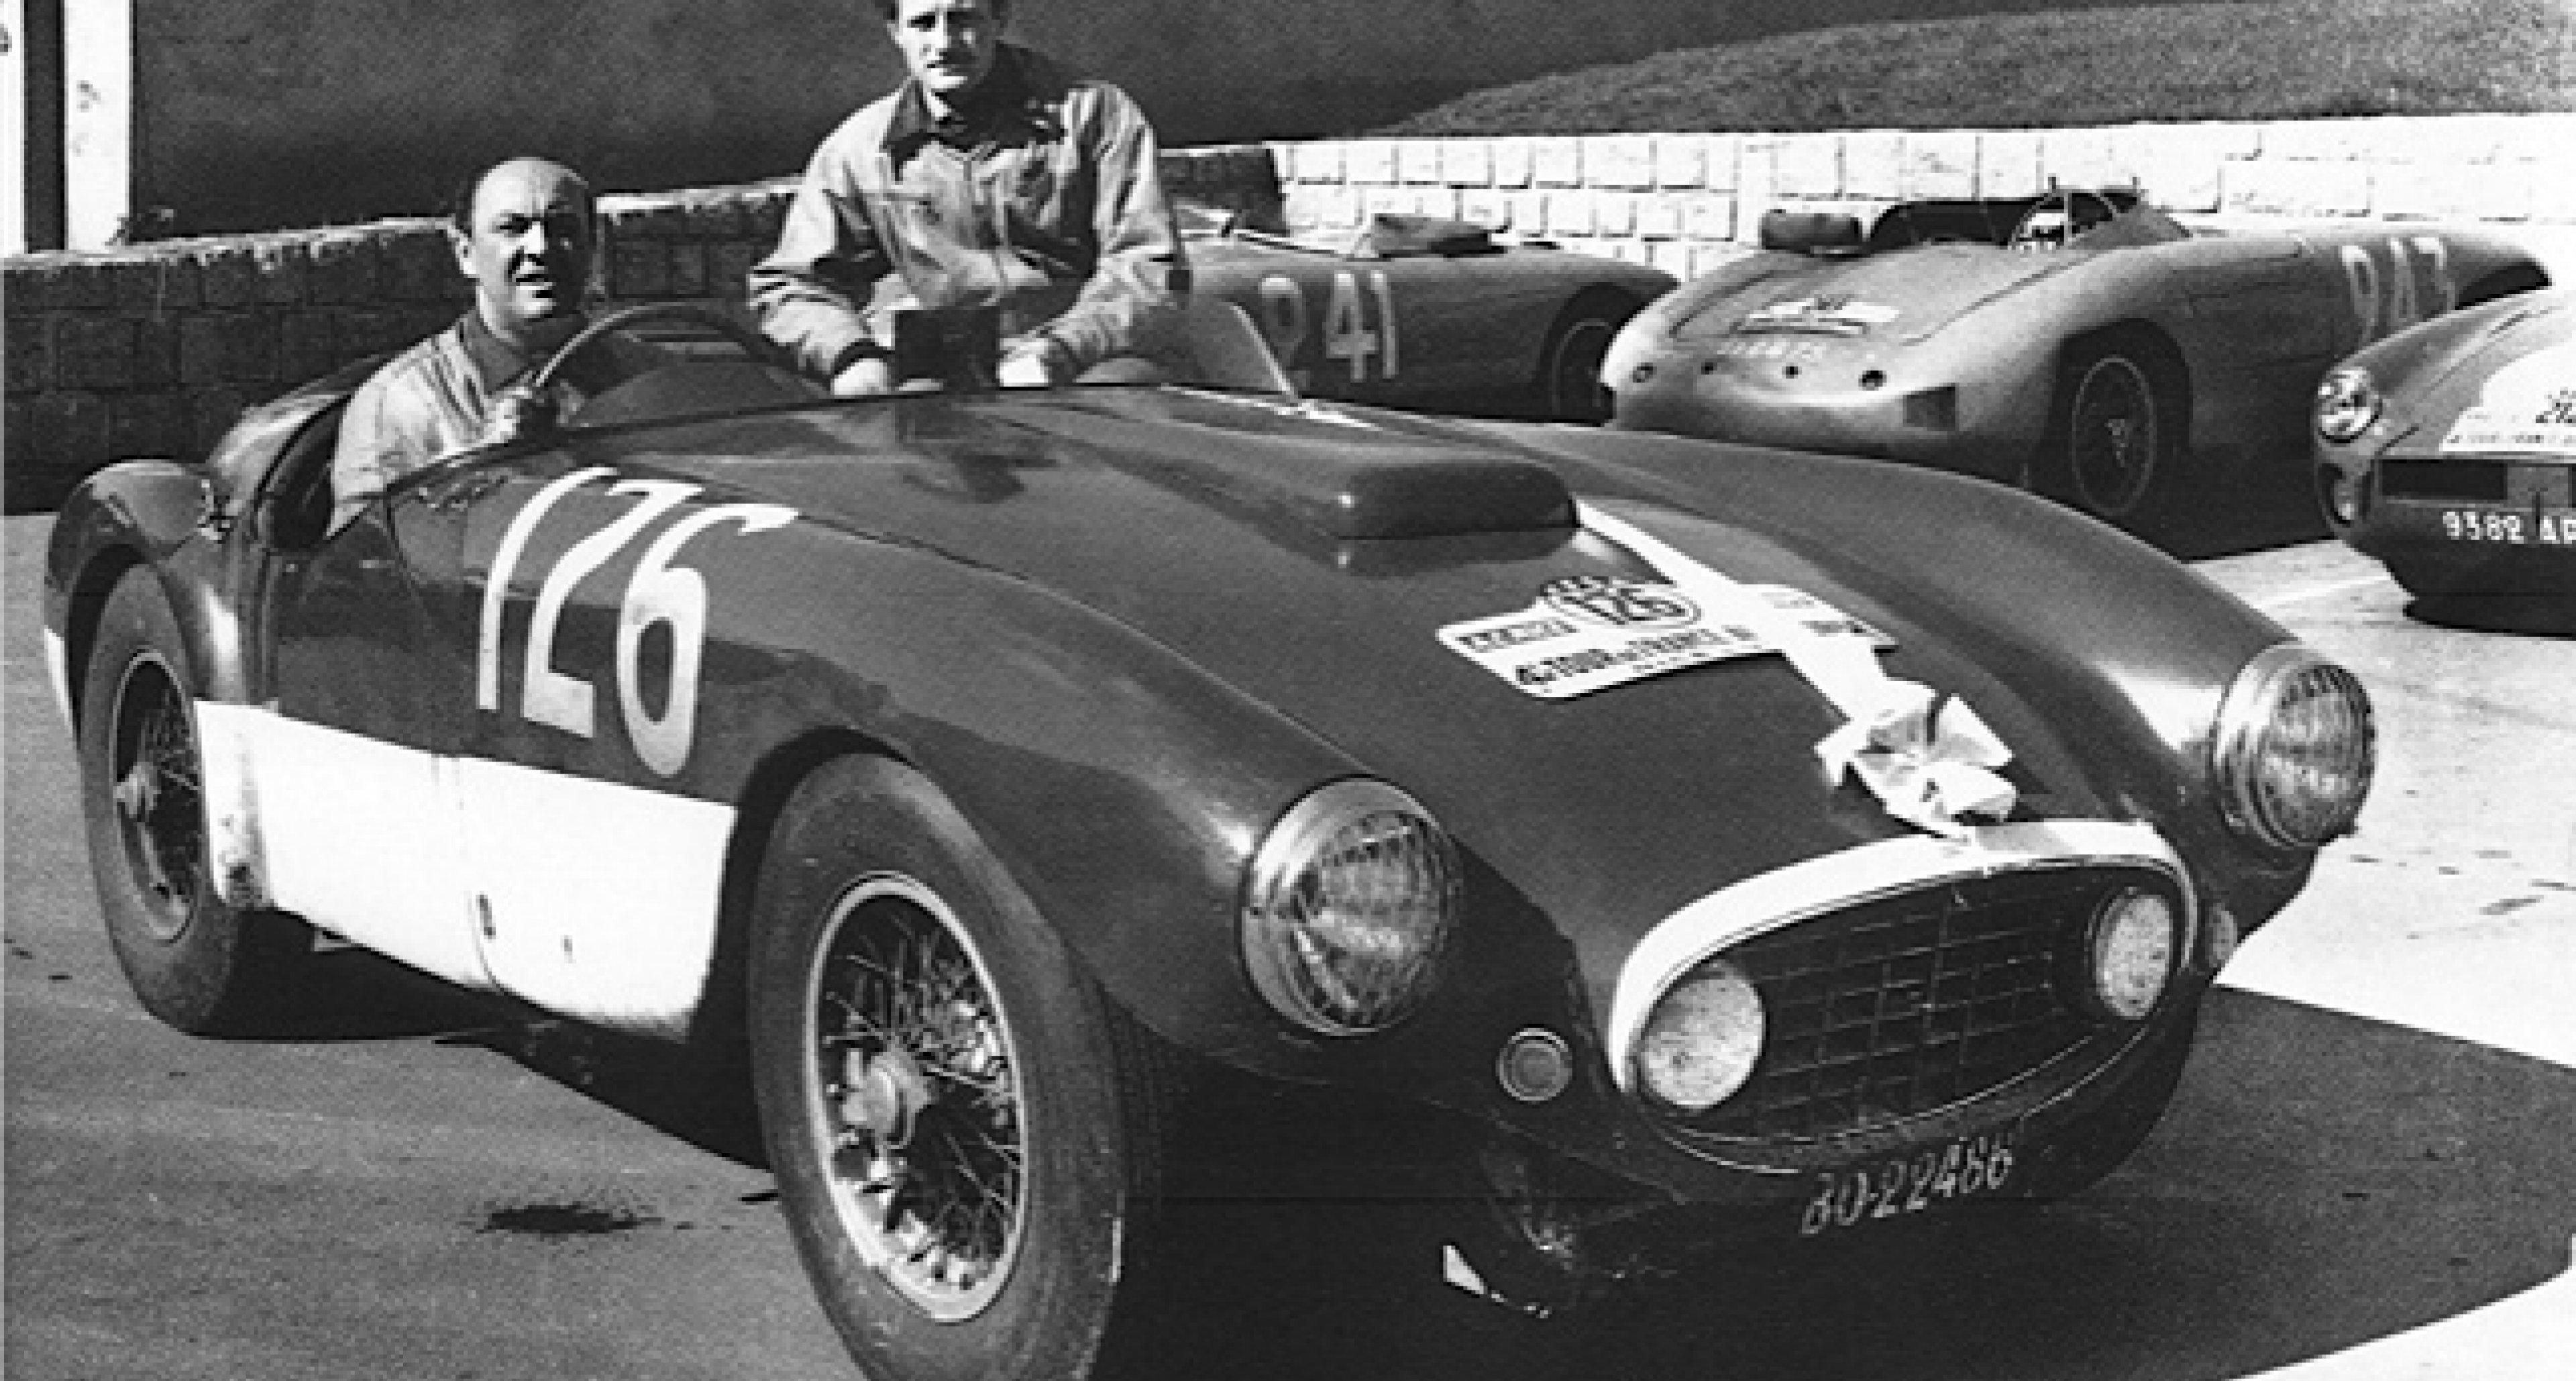 Herzet and Bianchi on the Tour de France 3 September 1954